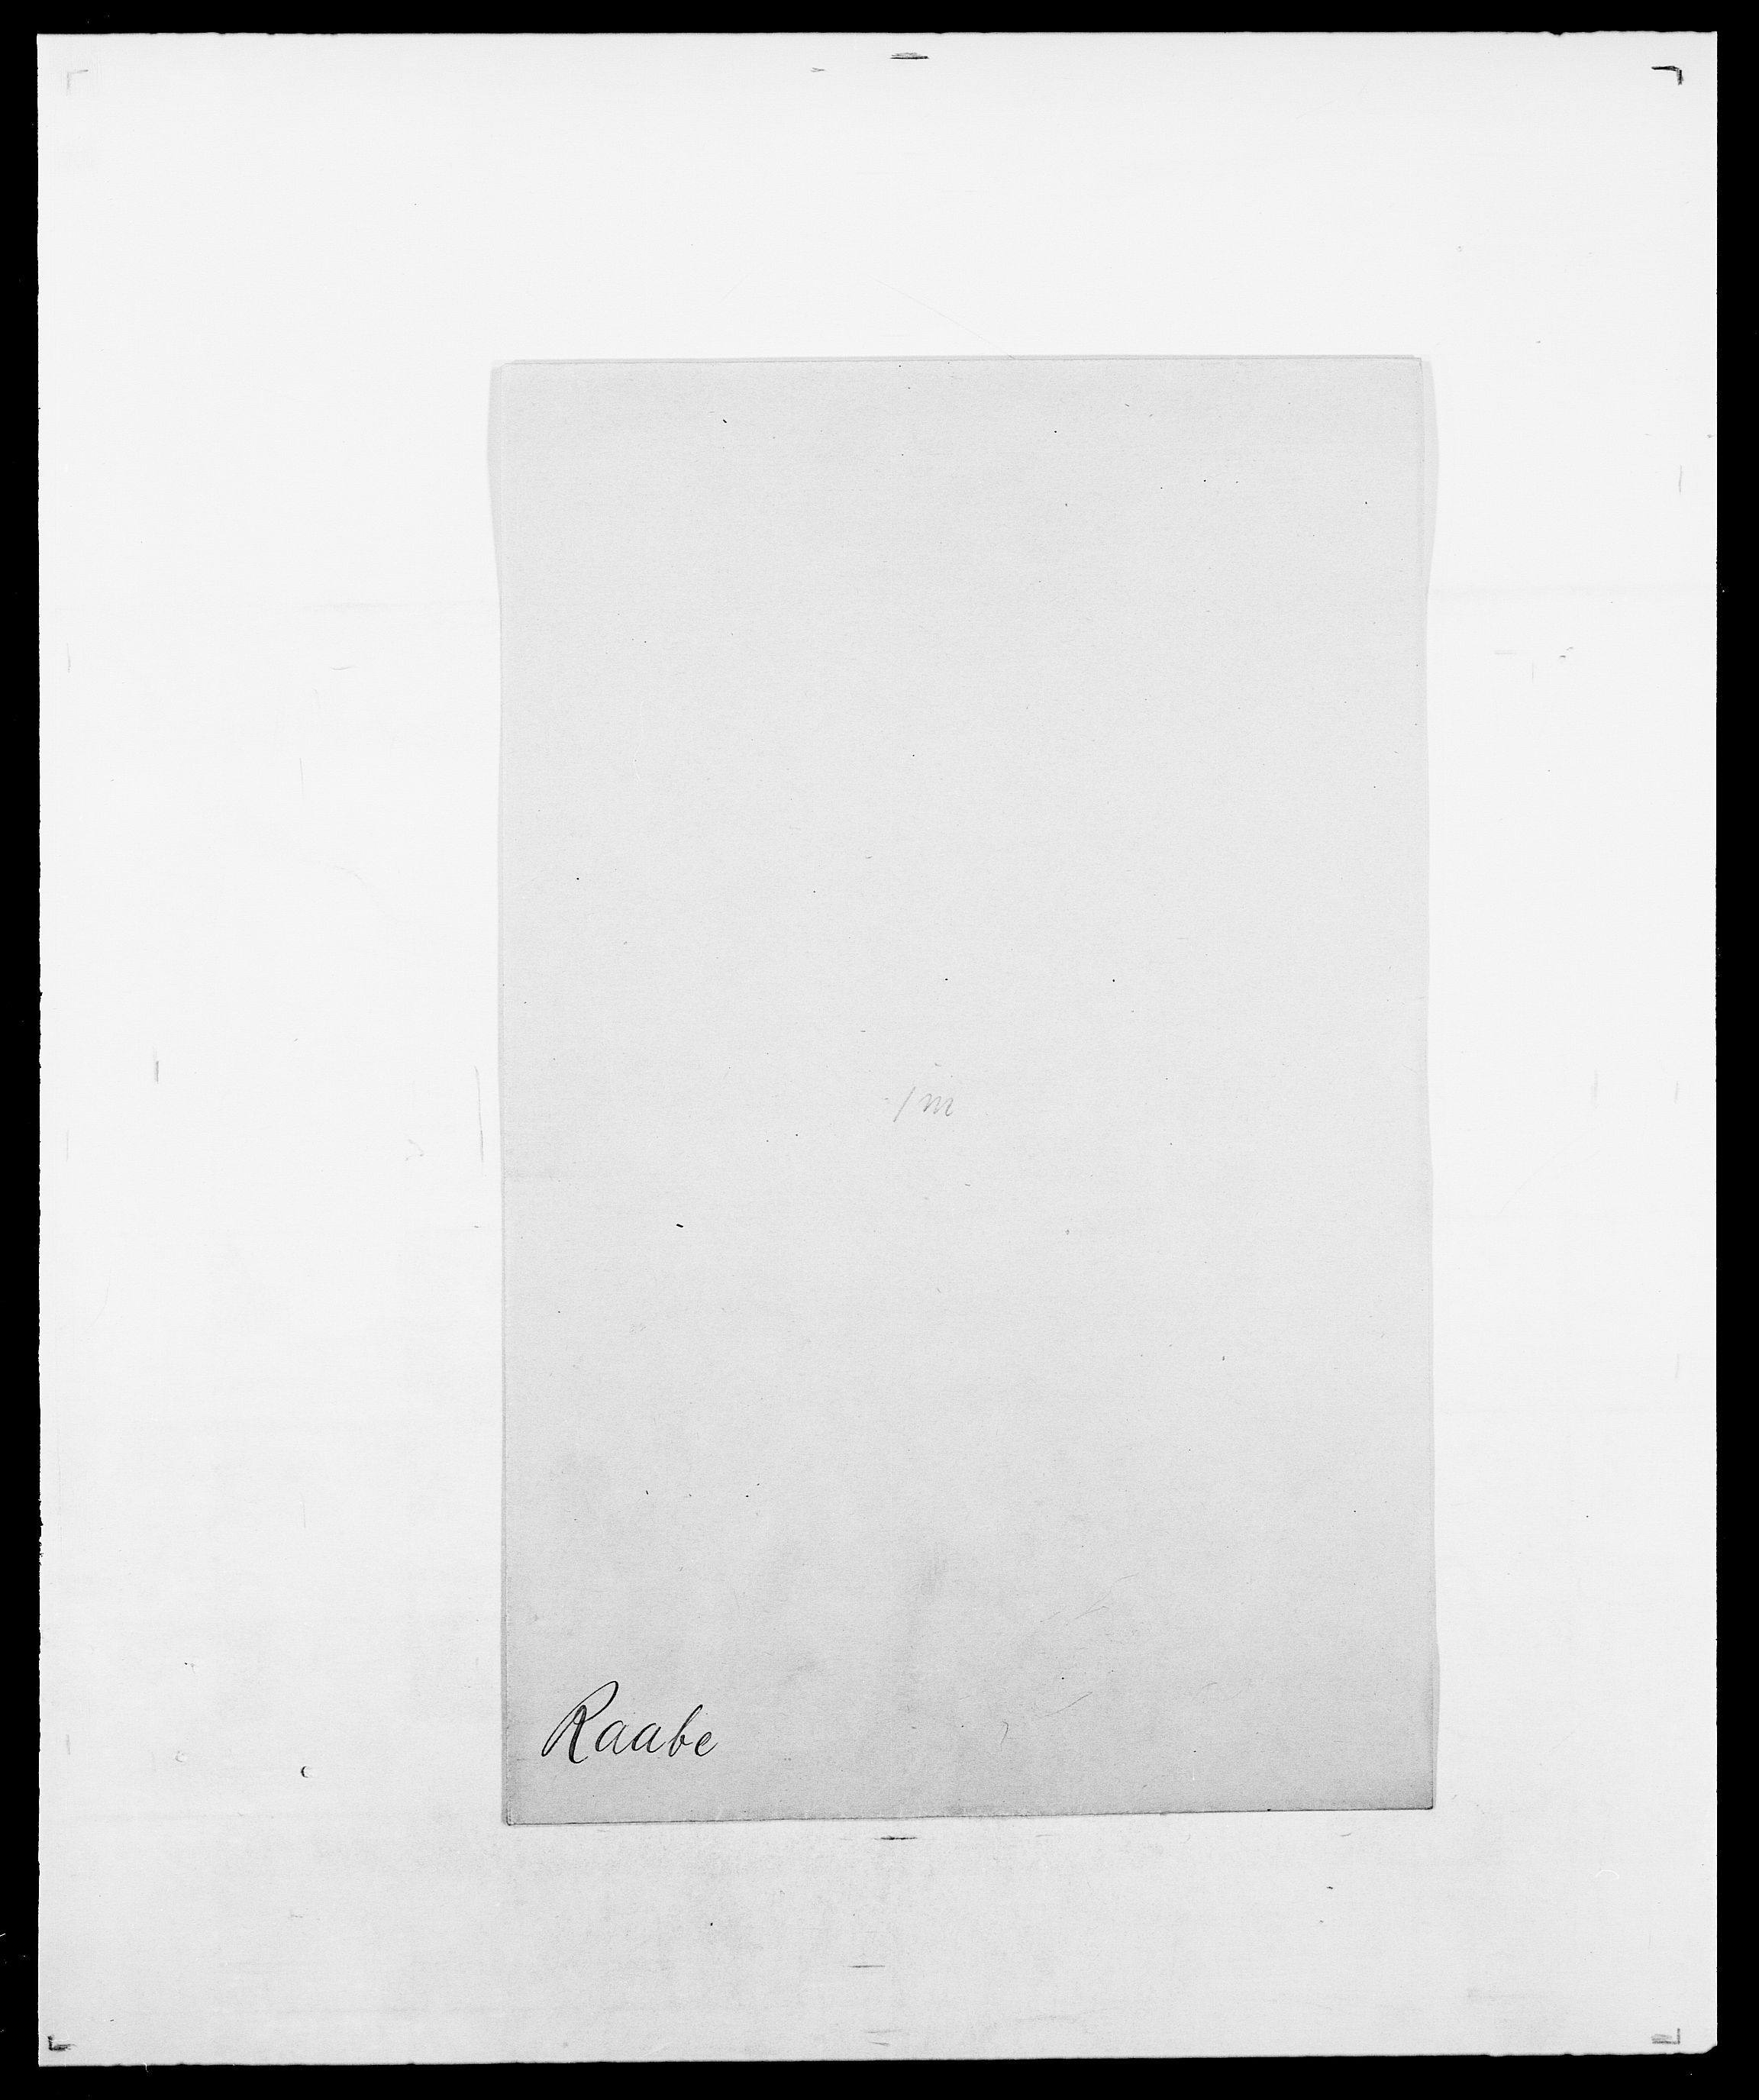 SAO, Delgobe, Charles Antoine - samling, D/Da/L0031: de Place - Raaum, s. 523